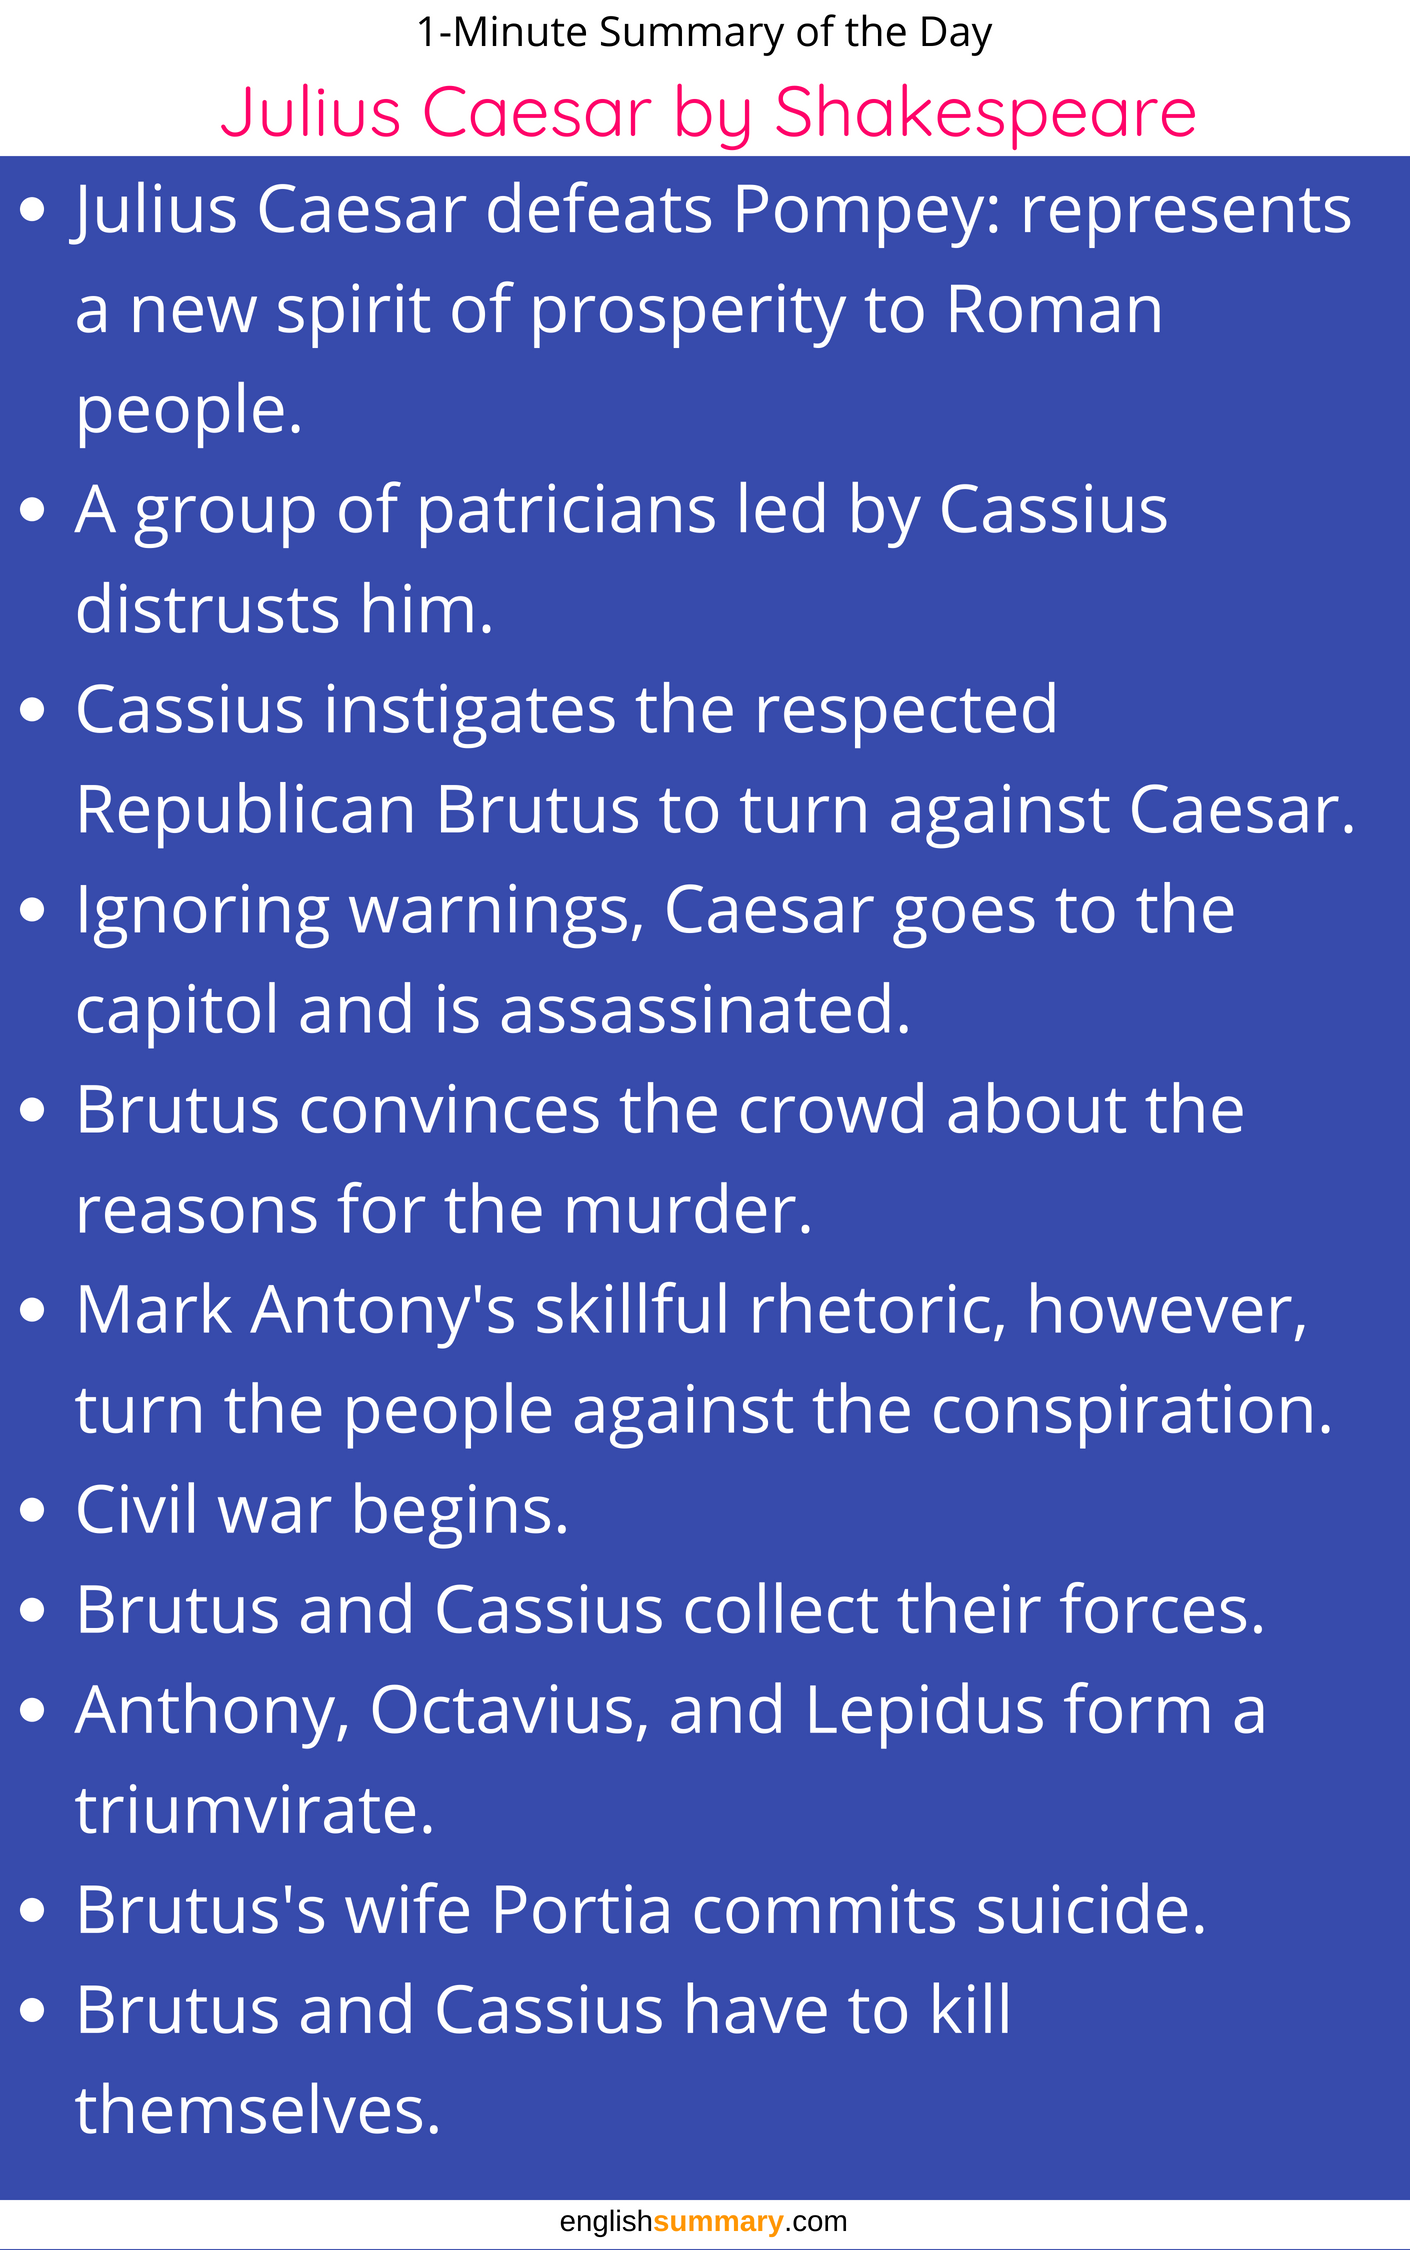 julius caesar short summary